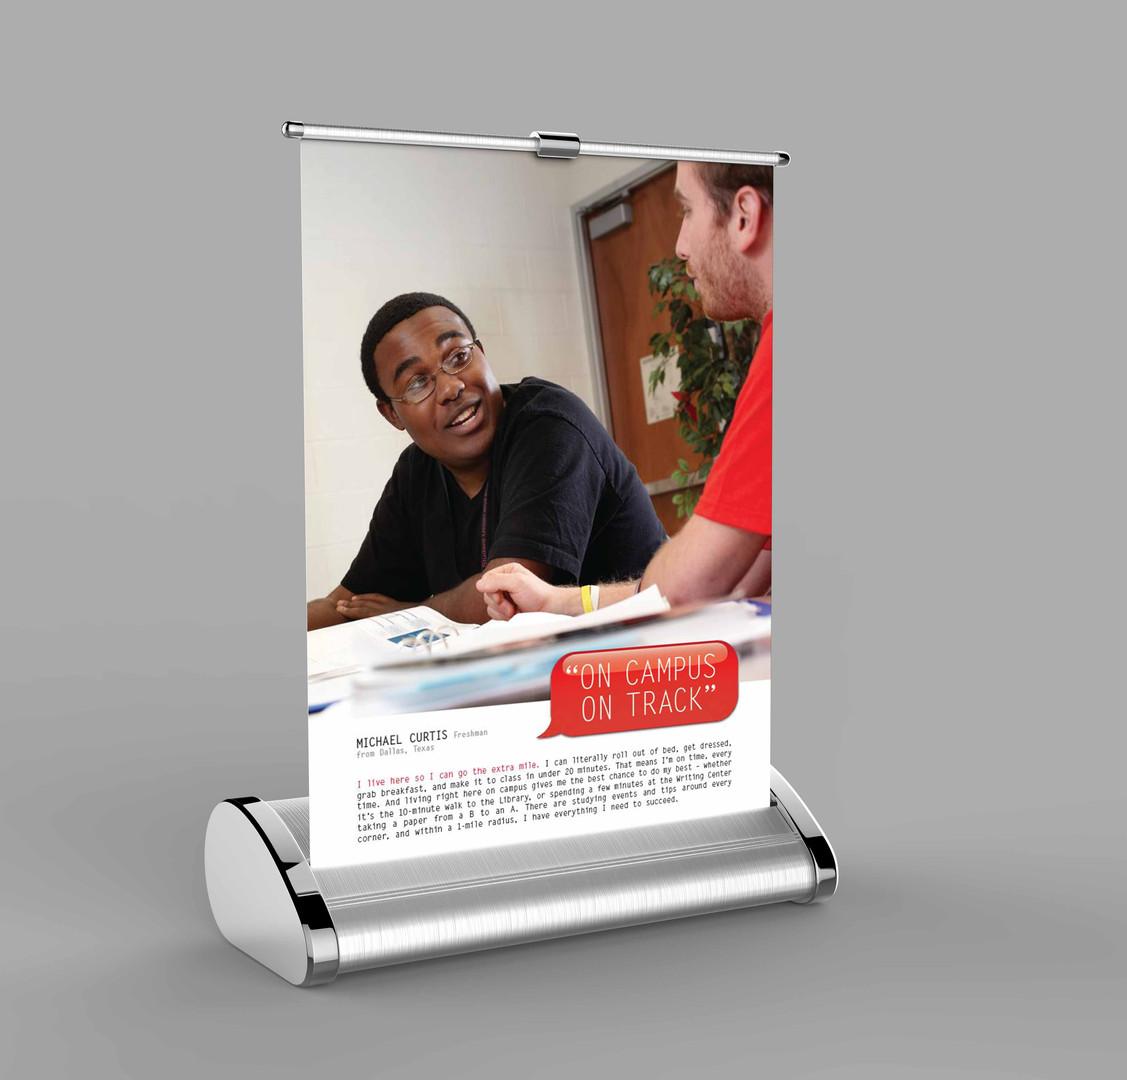 UNLV_table-banner-4BSite2020-SFW.jpg